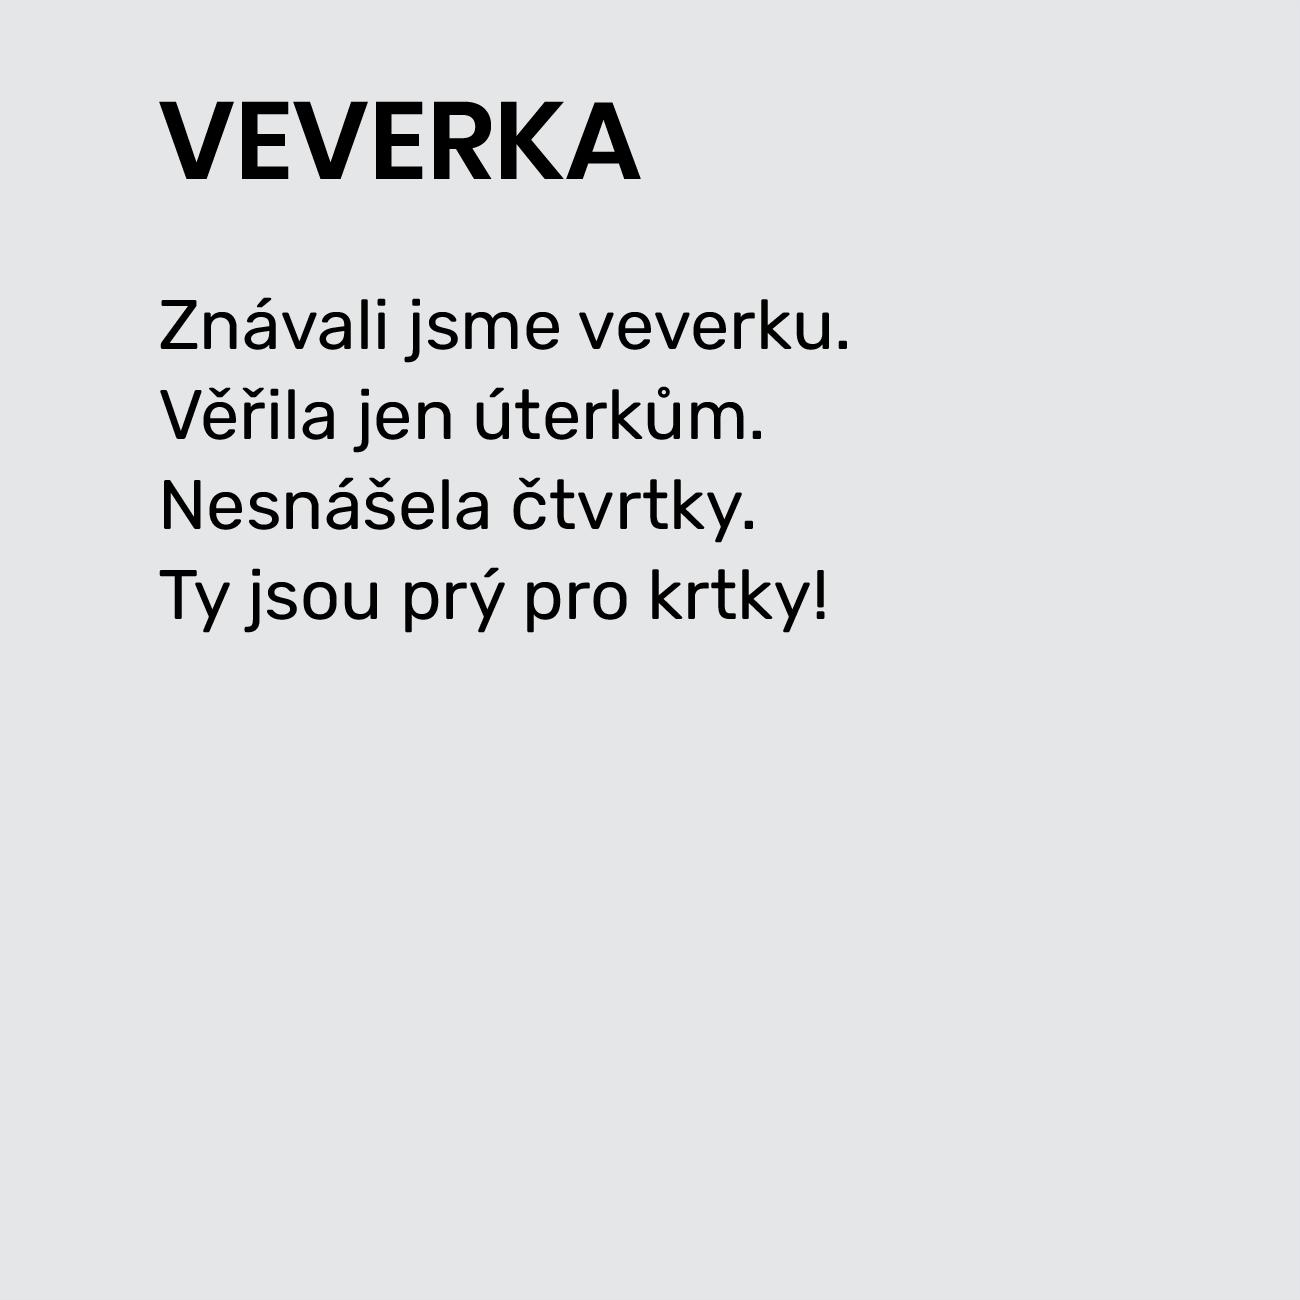 VEVERKA